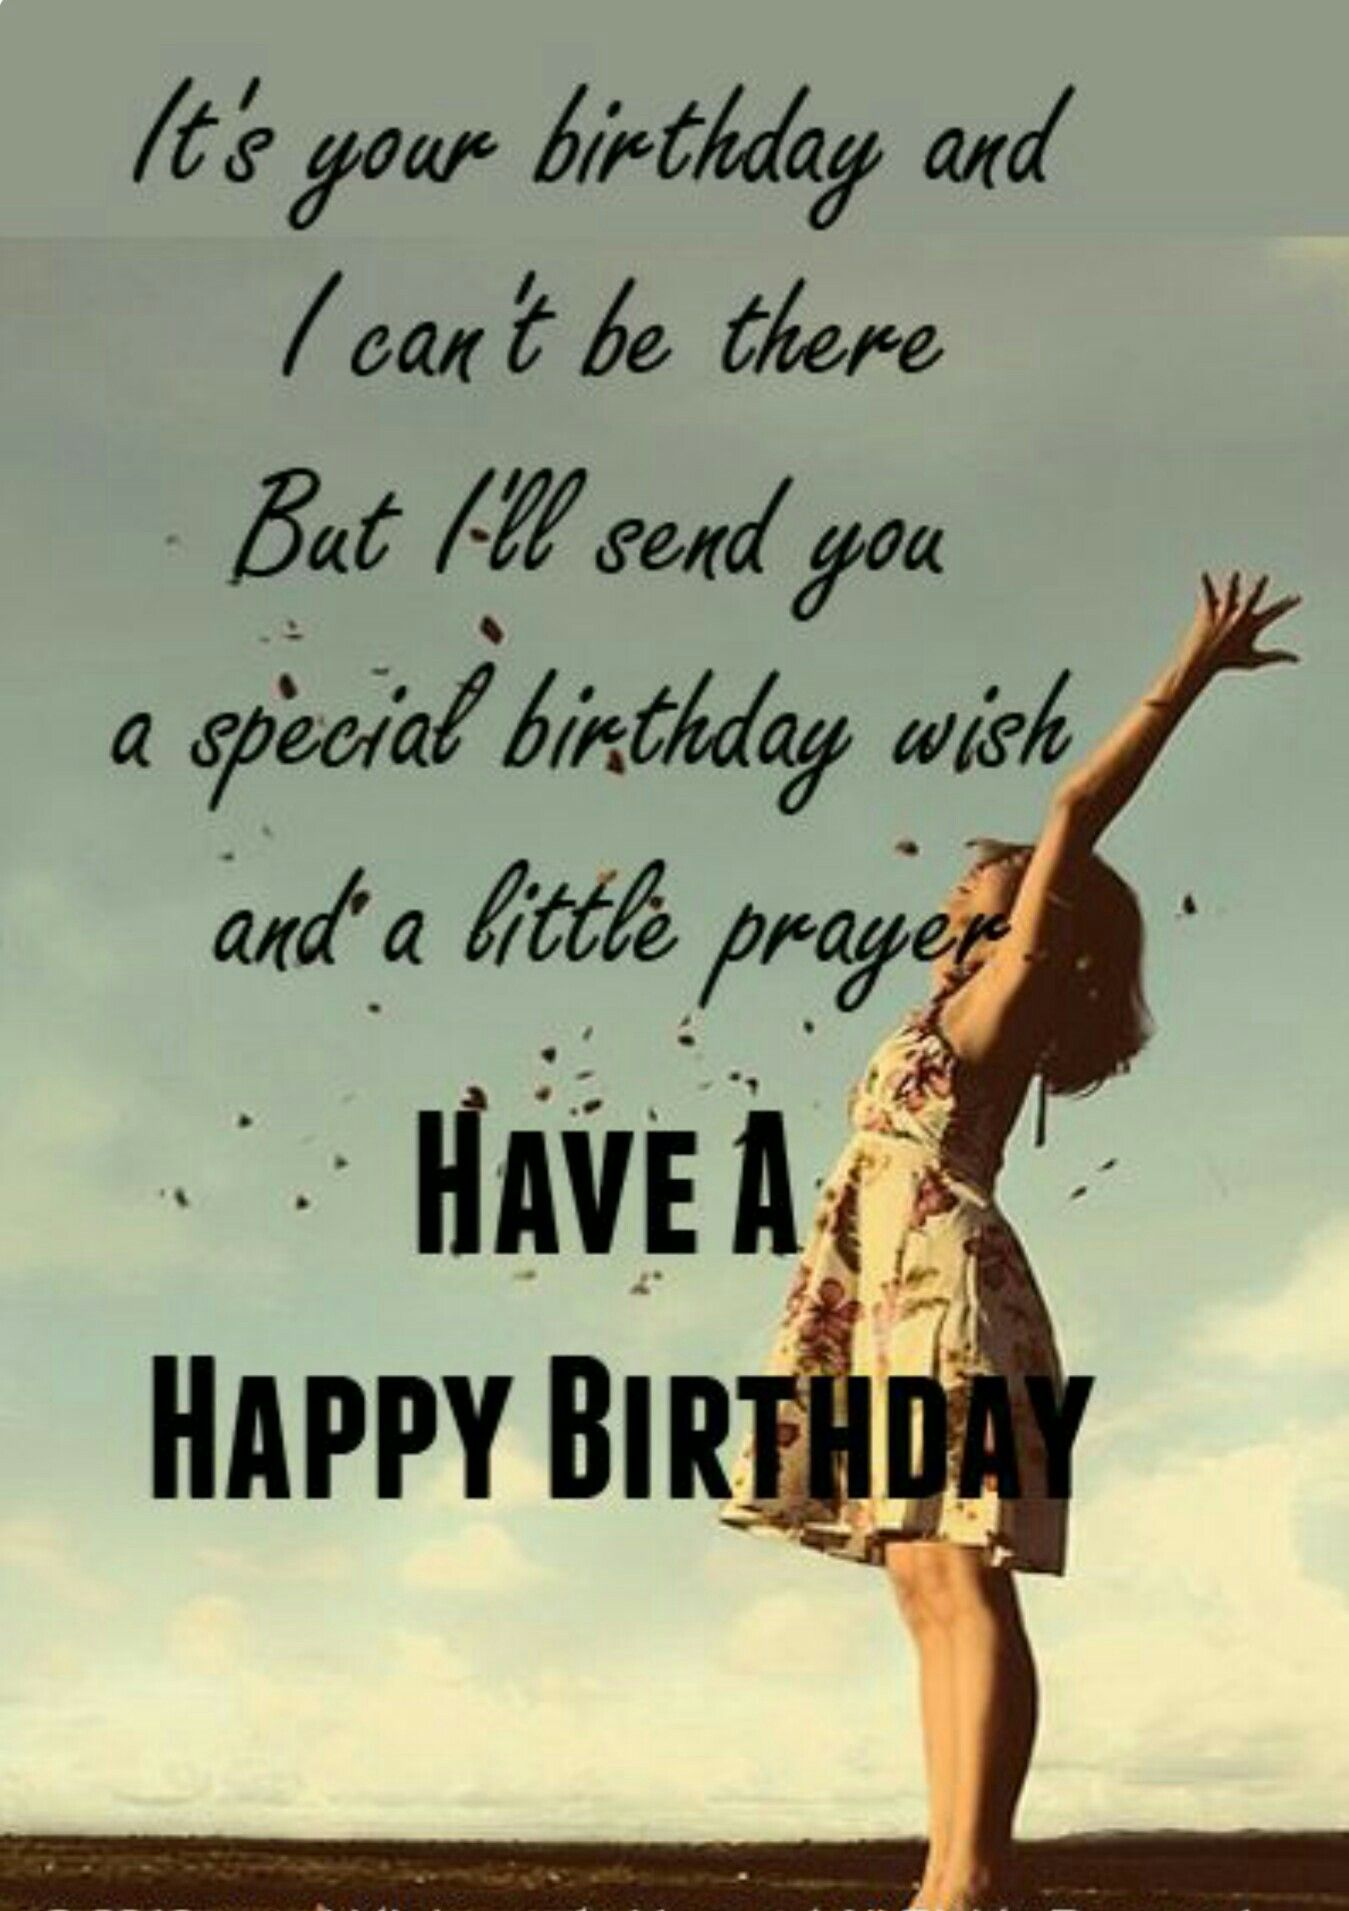 Pin by Alyson Turco on Happy Birthday | Pinterest ...